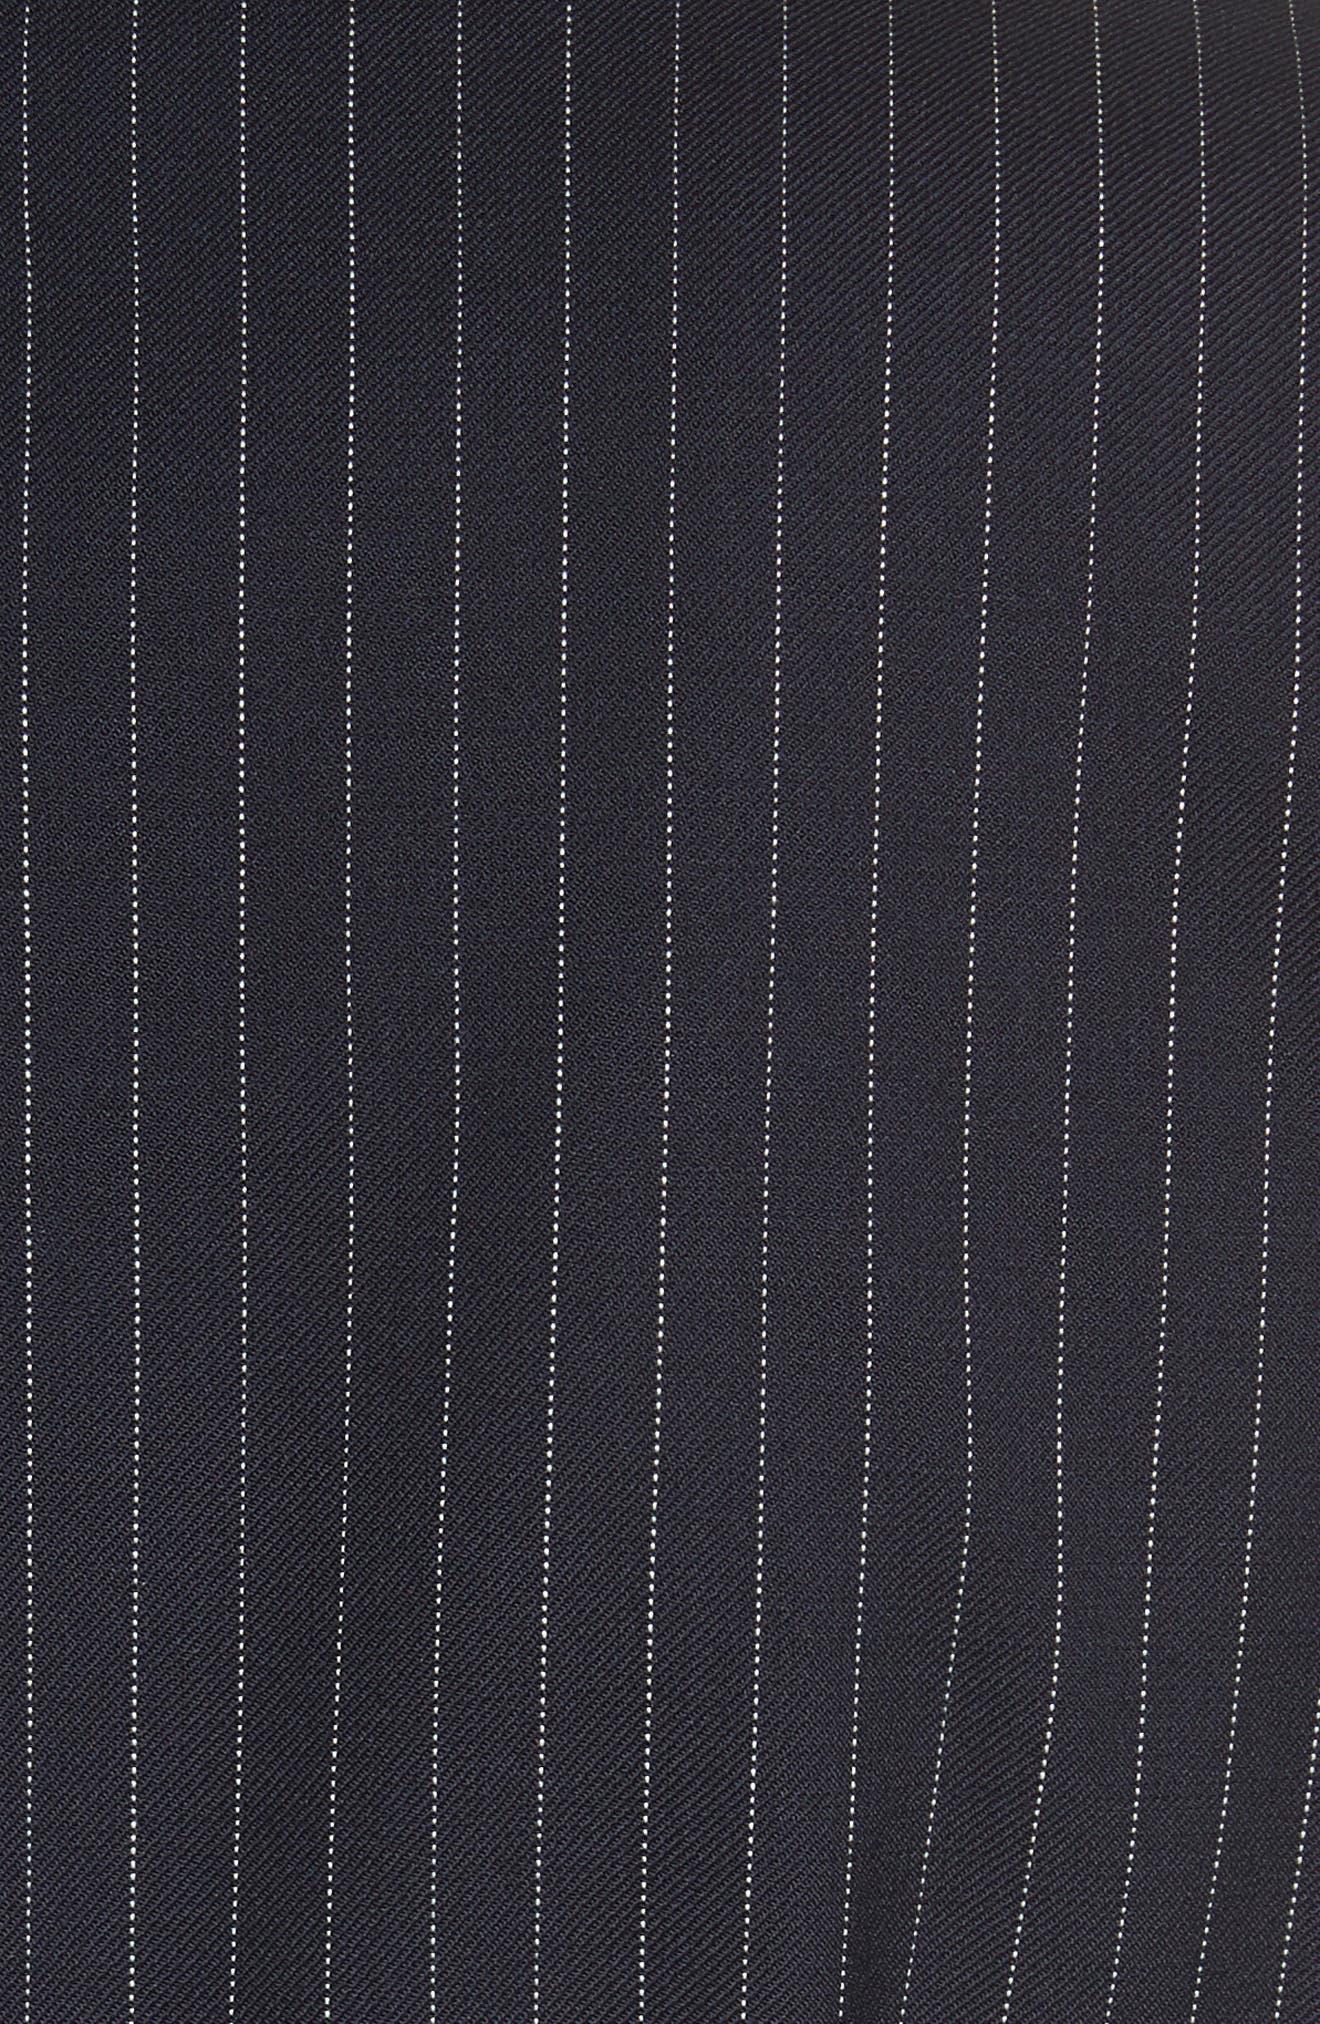 Giunto Stretch Wool Belted Blazer,                             Alternate thumbnail 5, color,                             Ultramarine